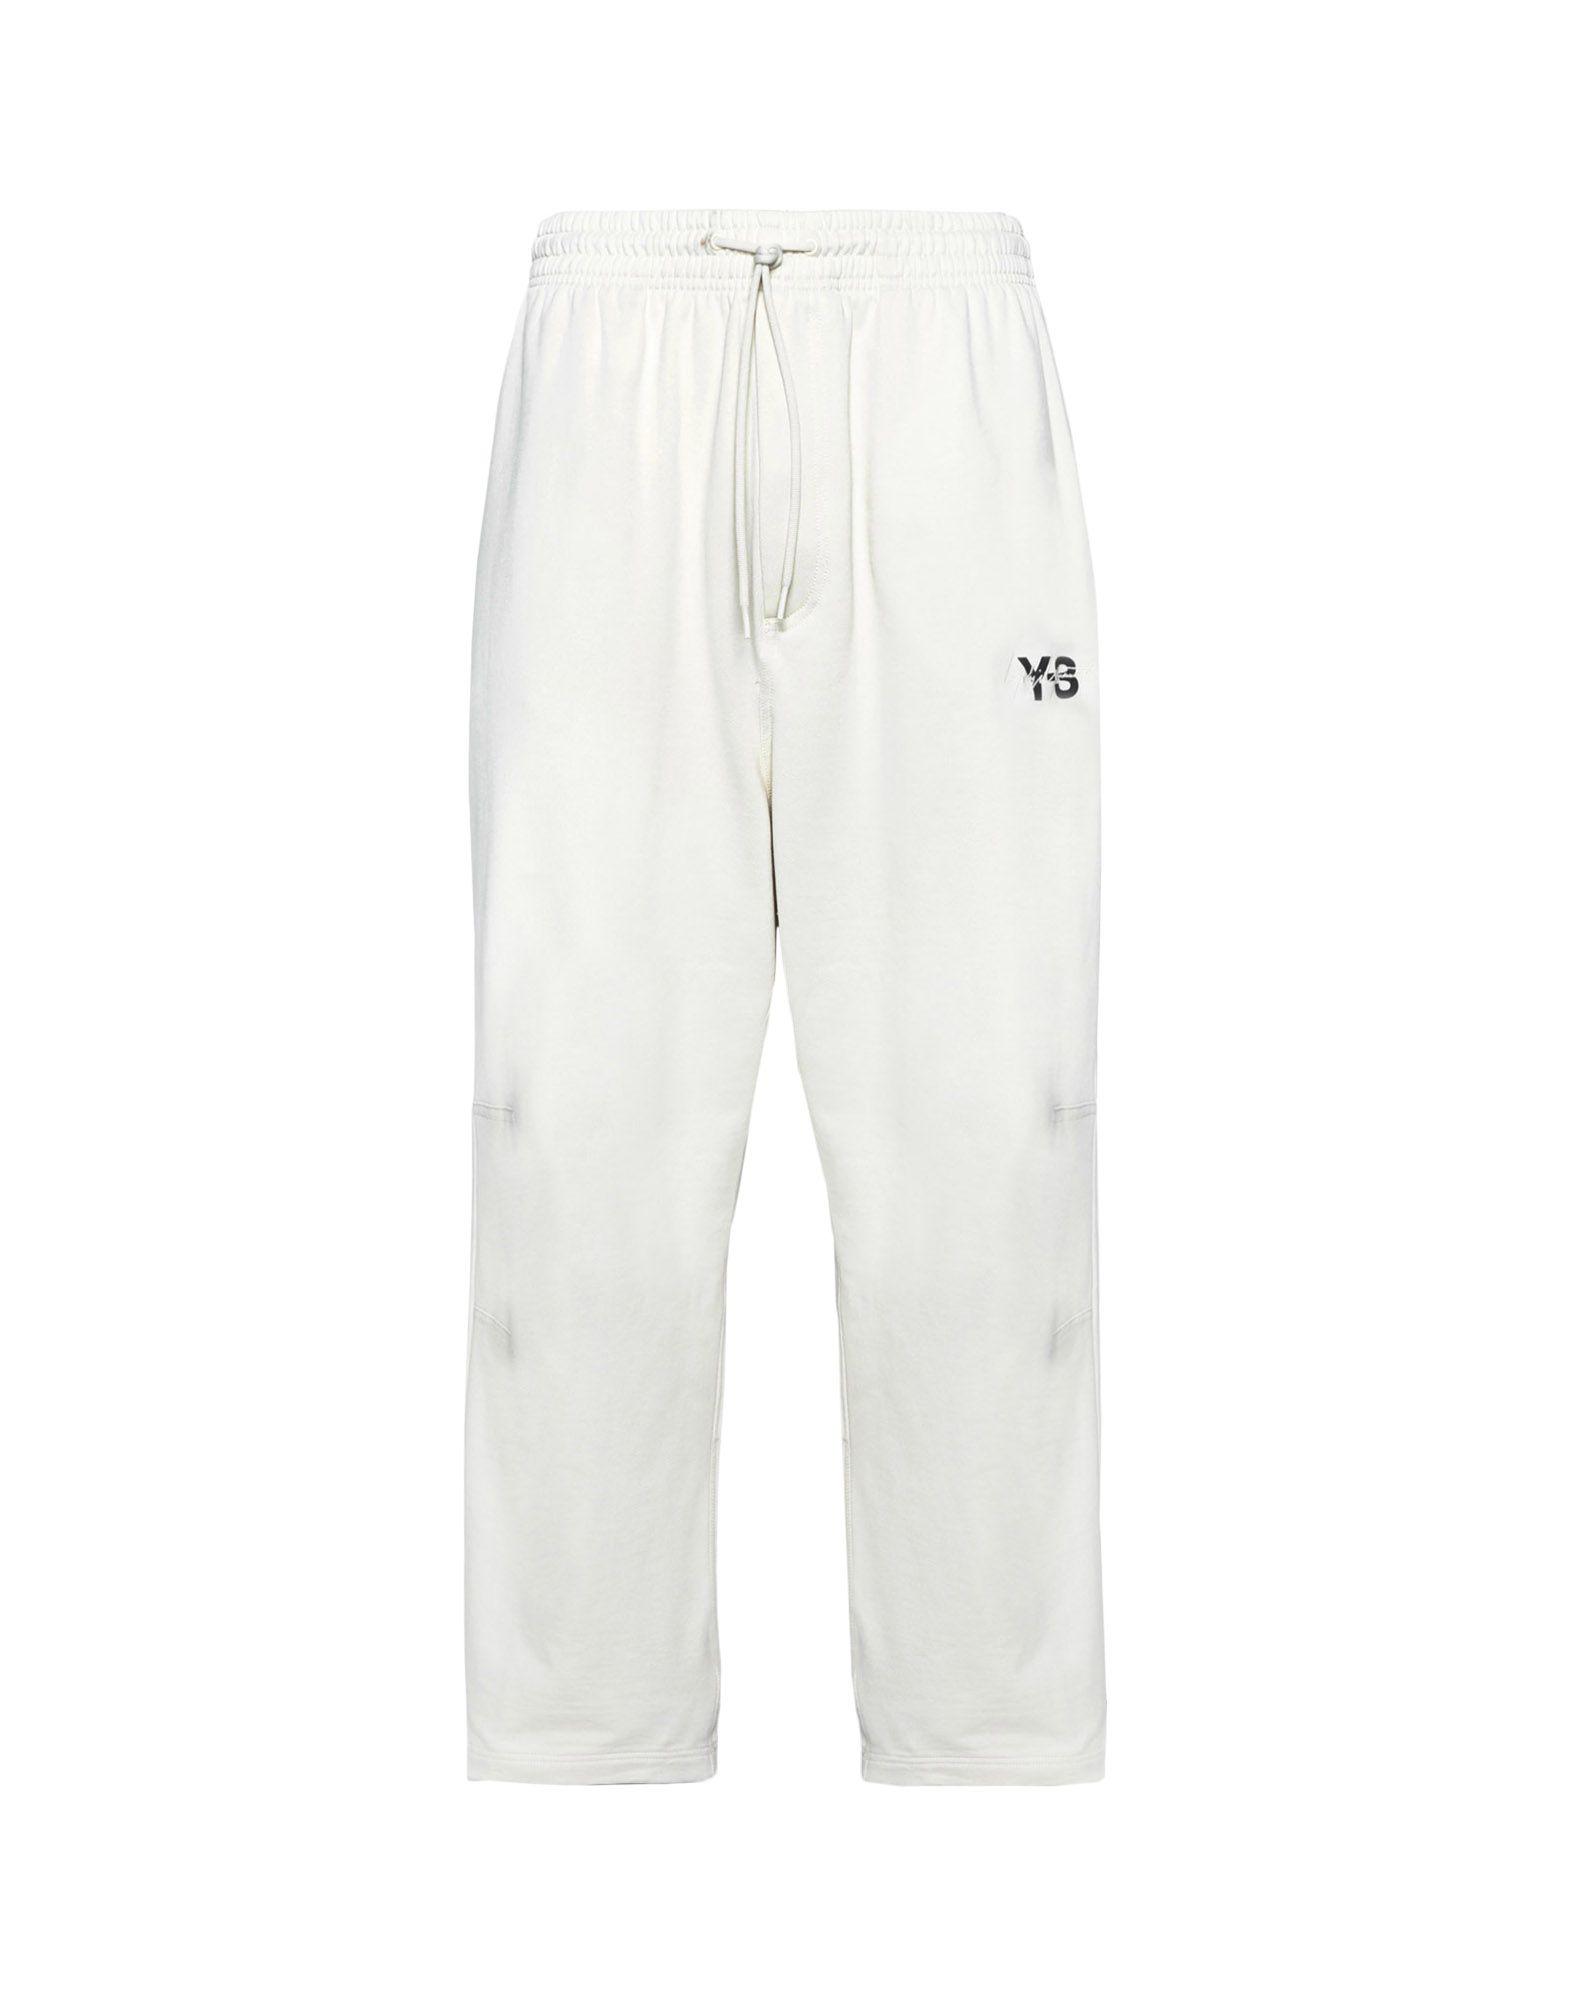 Y-3 Y-3 Sashiko Pants Sweatpants Man f